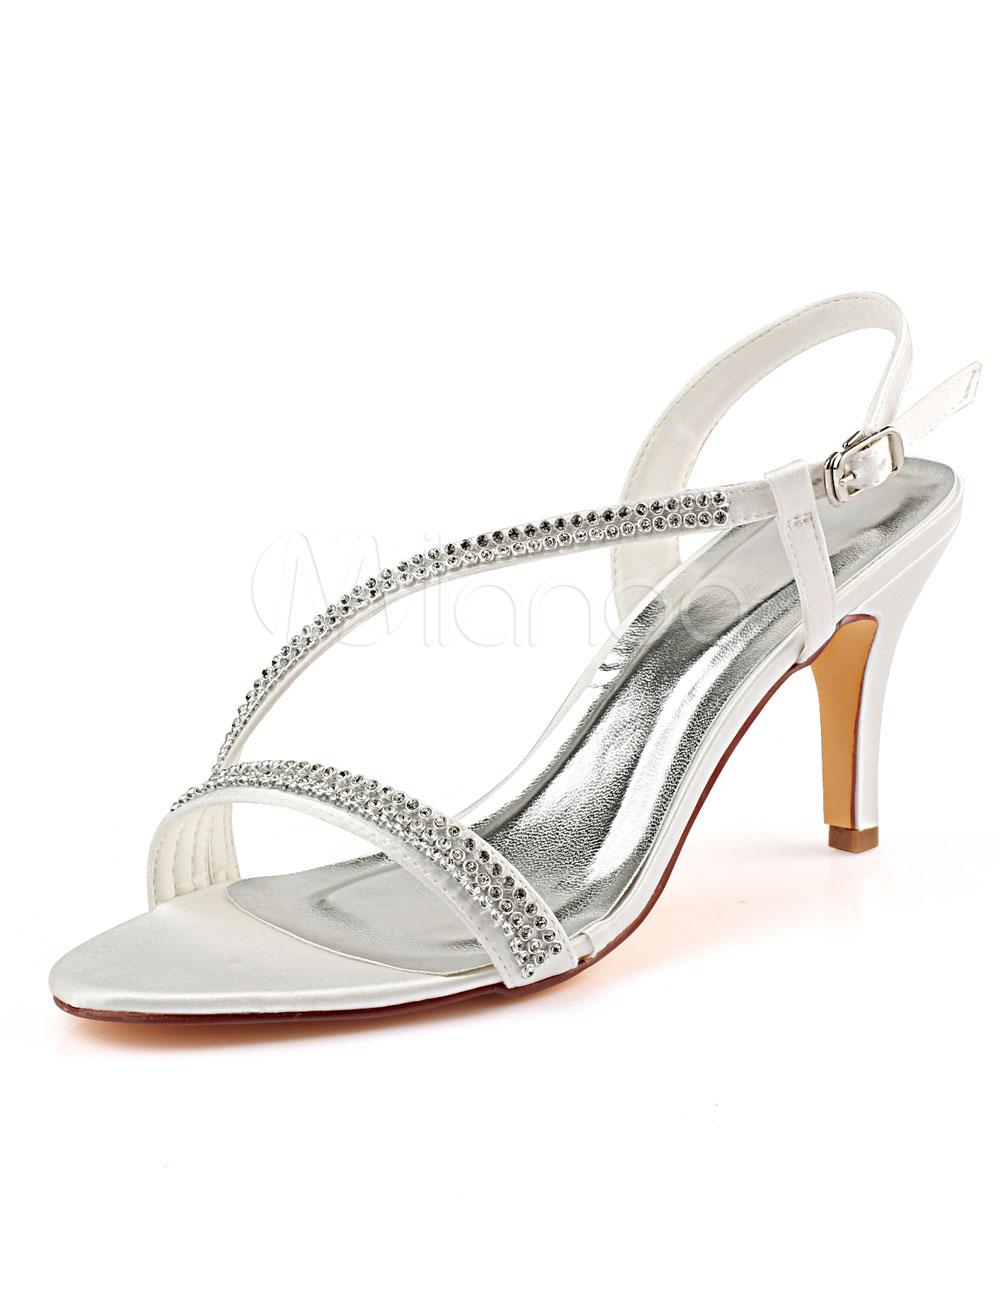 9b4f27c0e2 Ivory Wedding Shoes Satin Open Toe Rhinestones Bridal Shoes High Heel  Sandals